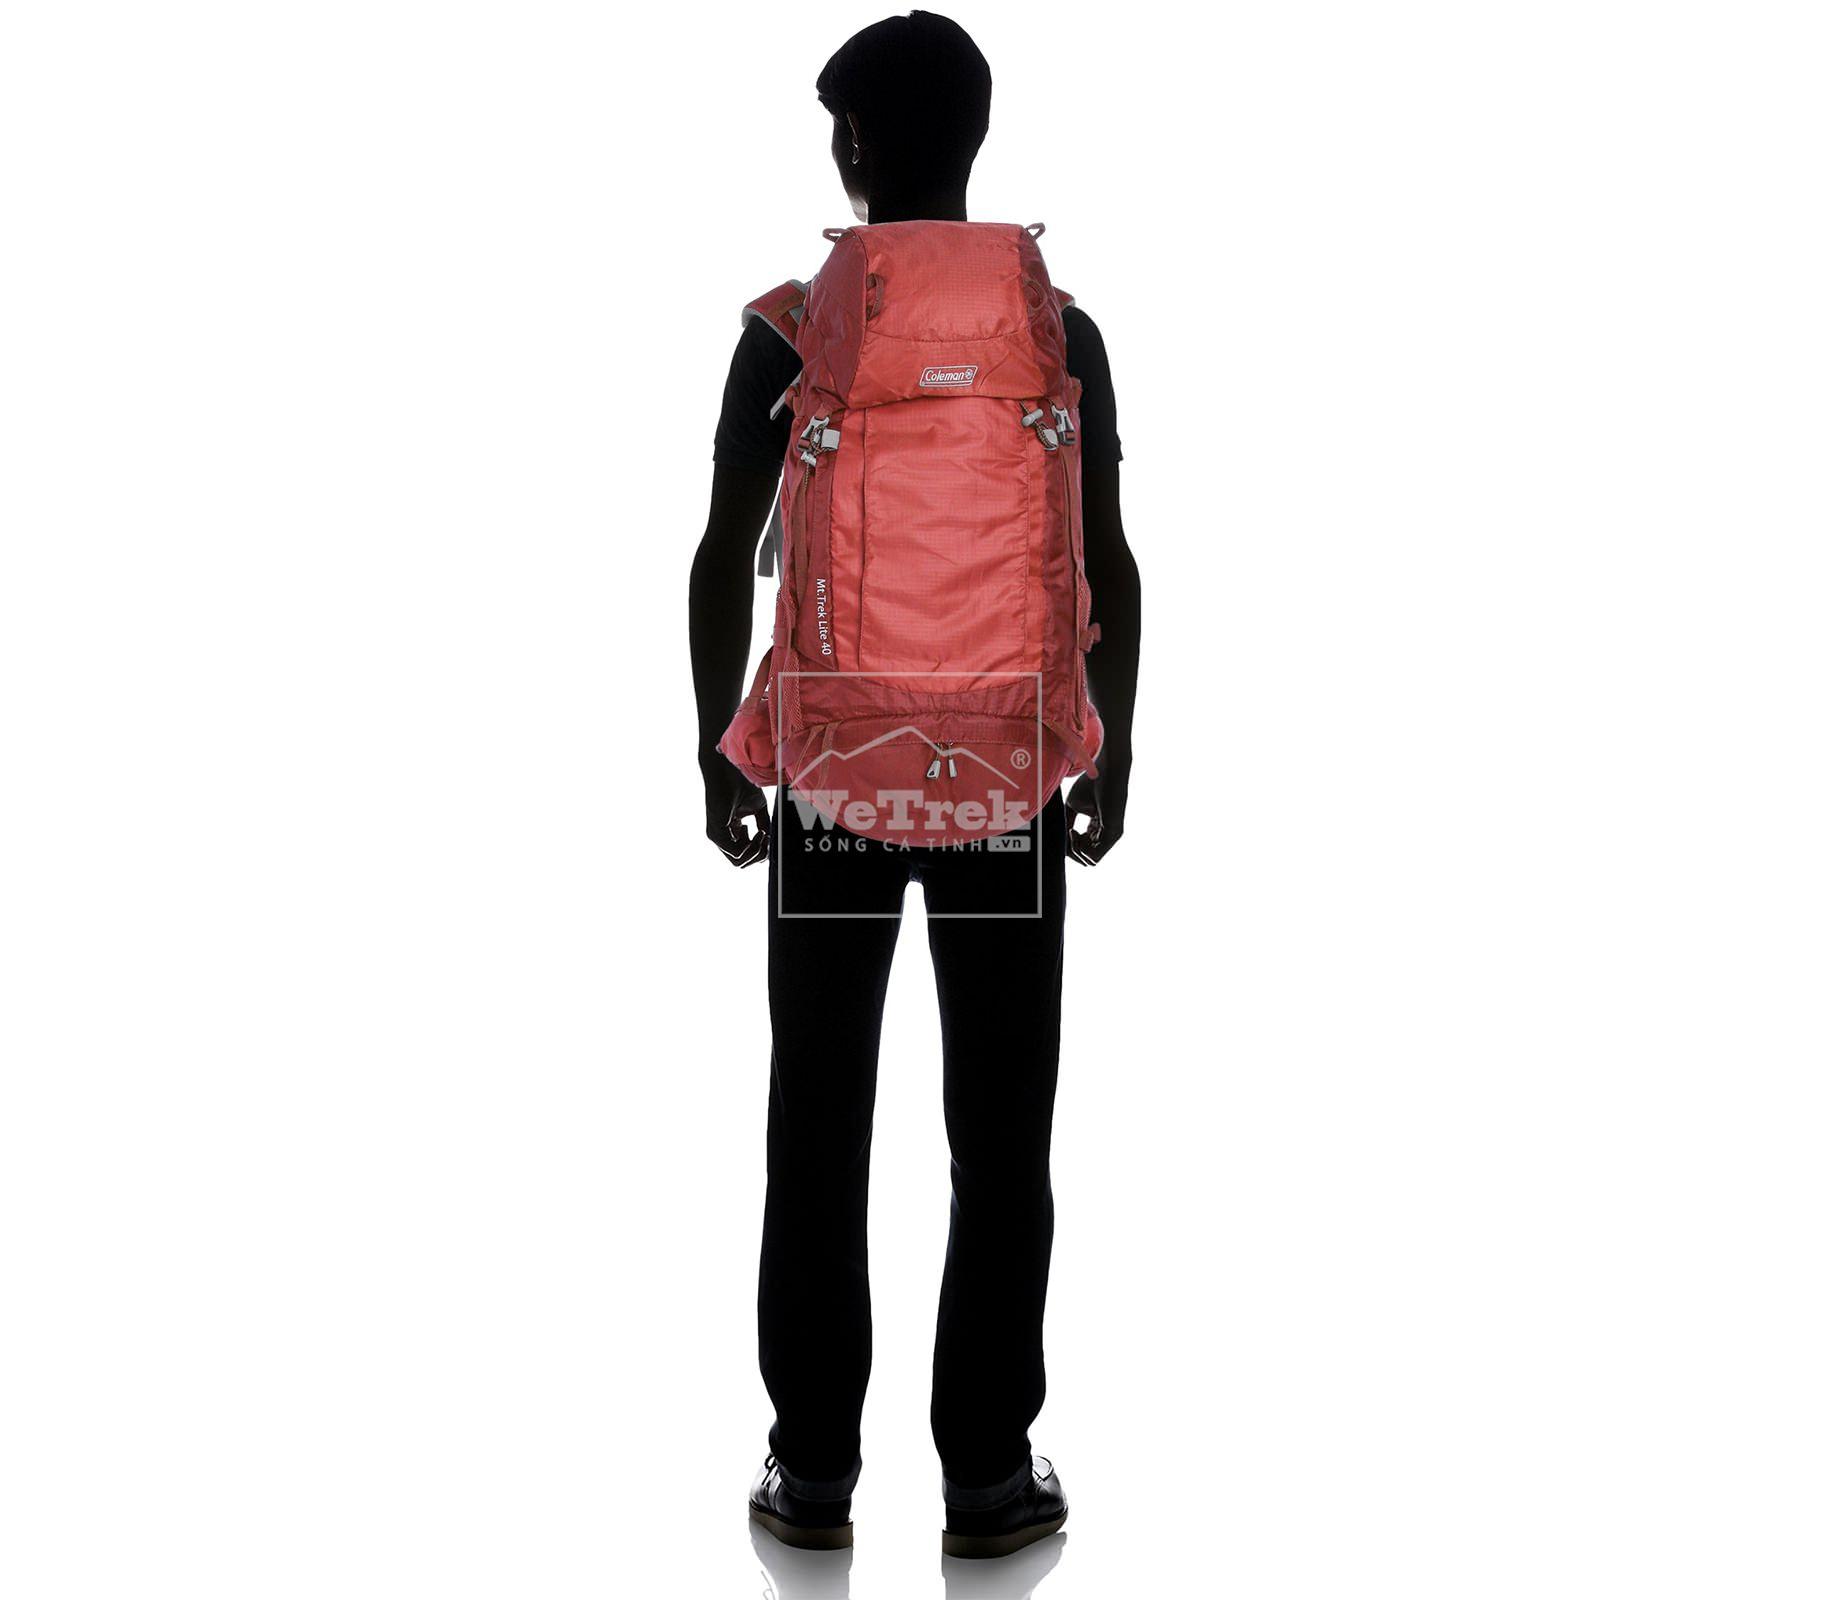 ba-lo-leo-nui-40l-coleman-mttrek-lite-backpack-red-cbb4091rd-7456-wetrek.vn-2